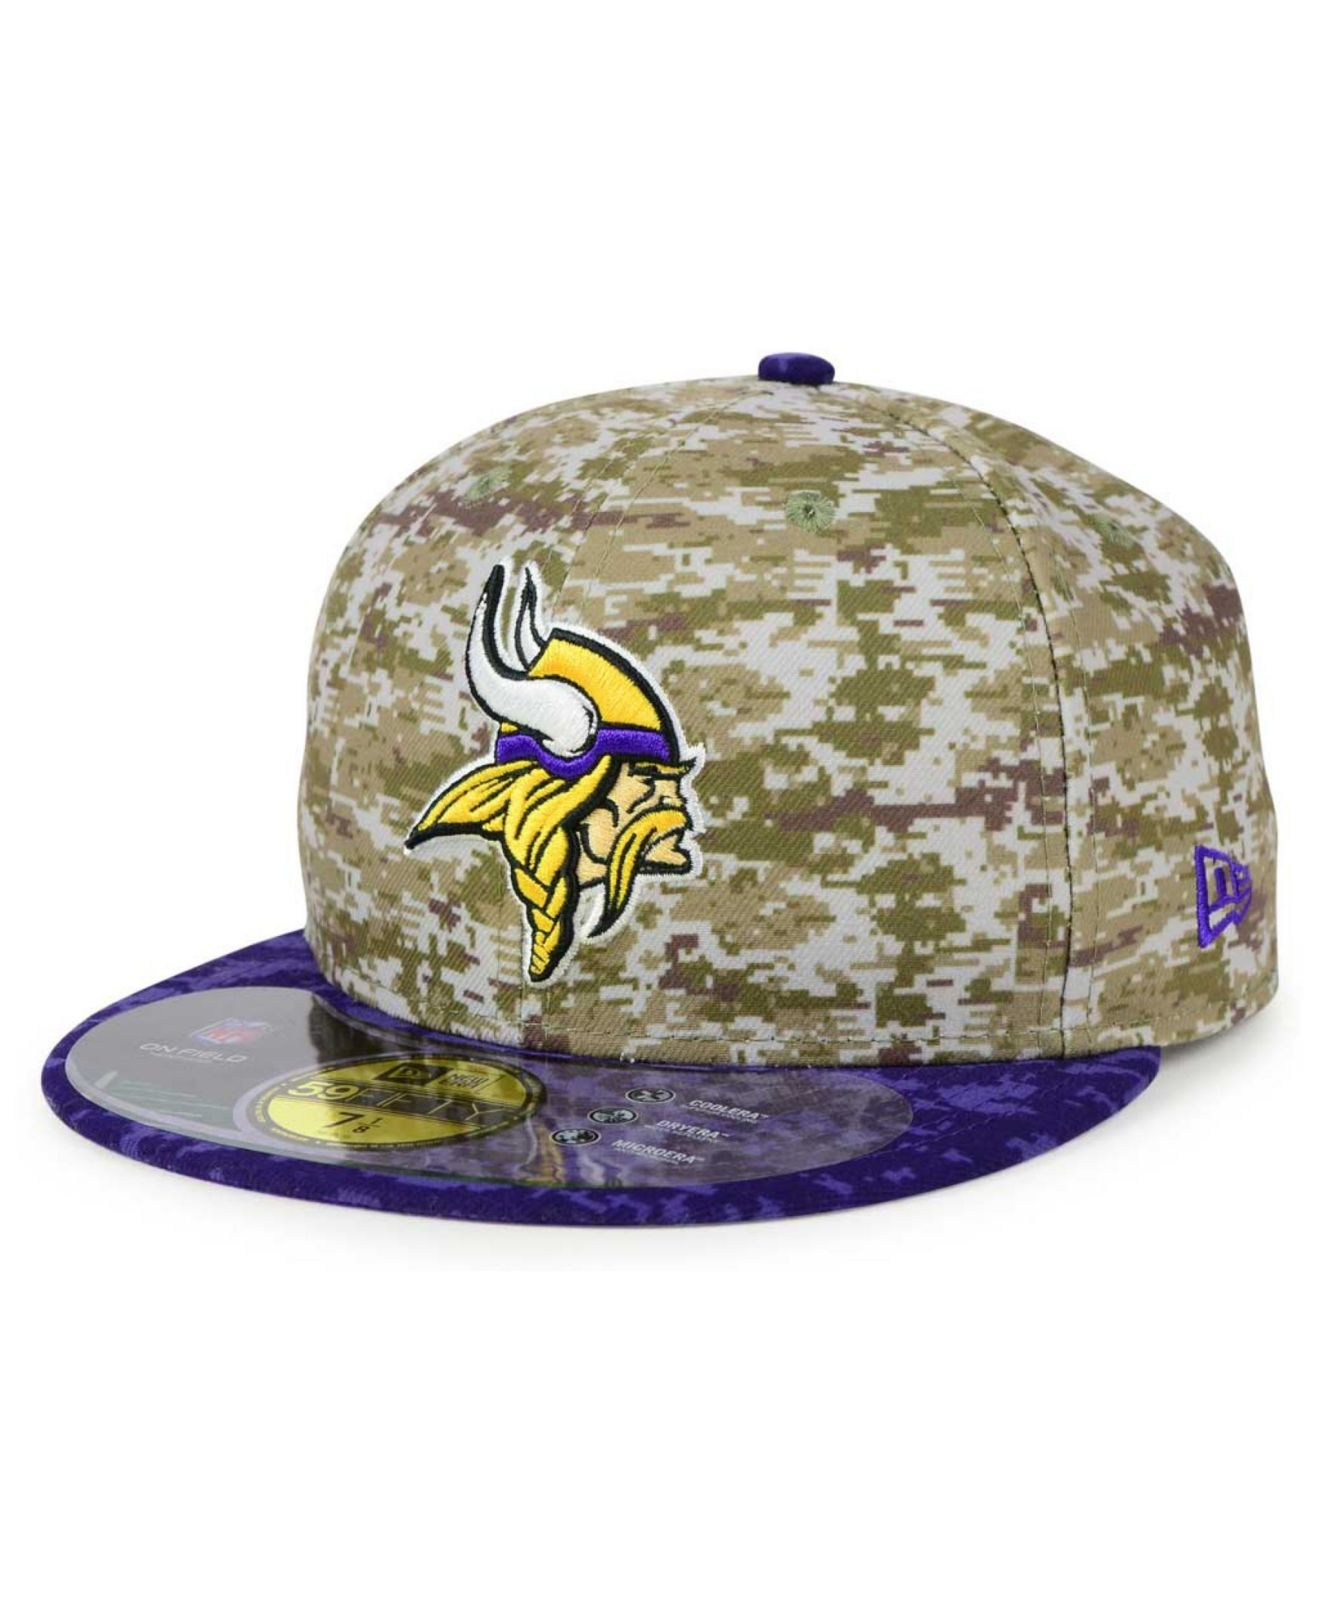 6aacf3ba6 ... New Era NFL 2015 Salute to Service 39THIRTY Cap  low price 27051 e034c  Lyst - Ktz Minnesota Vikings Salute To Service 59fifty Cap in Blue ...